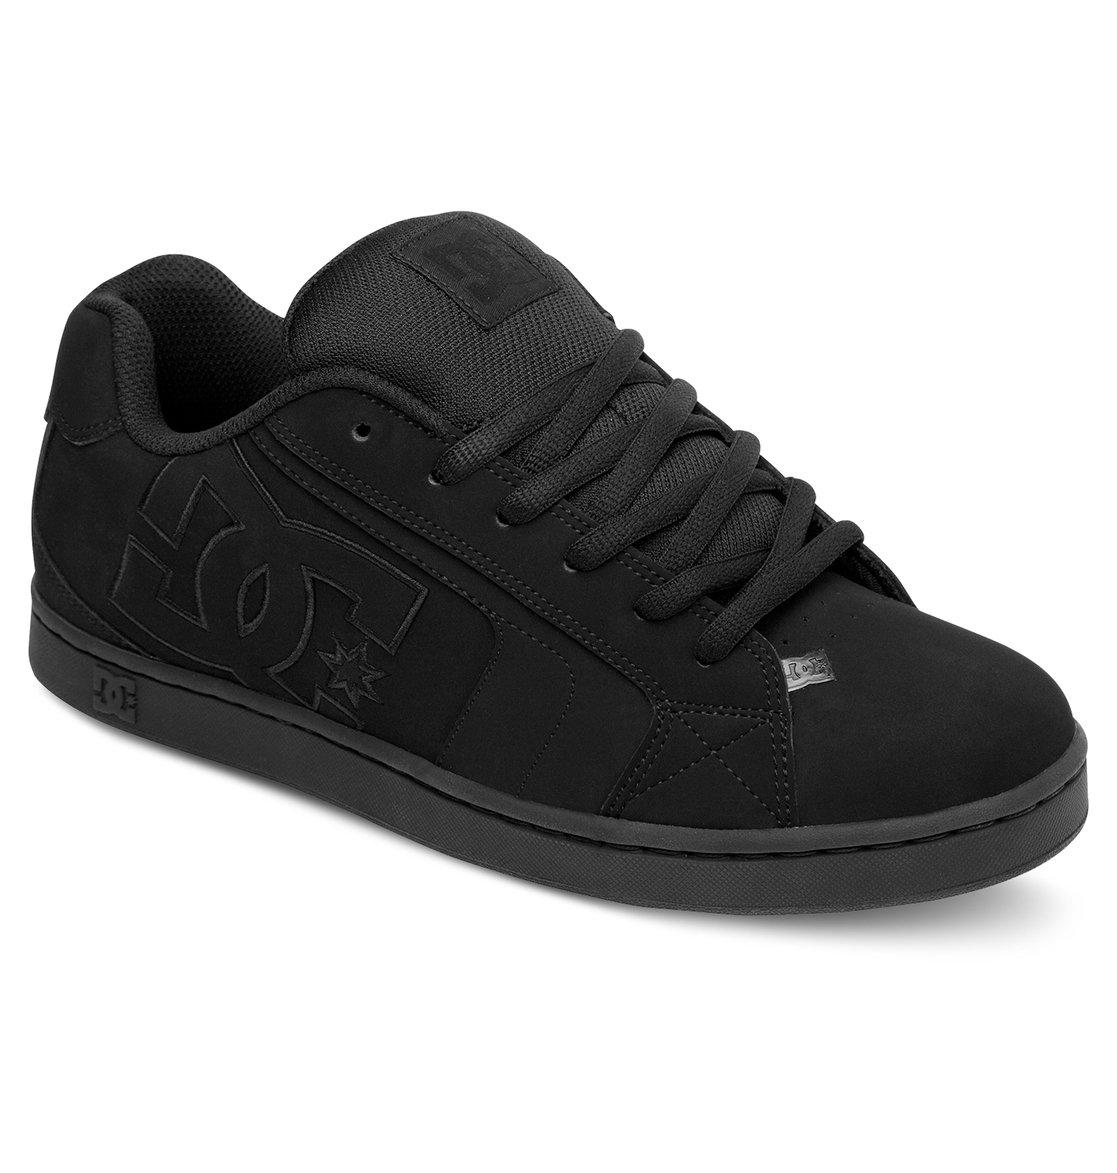 Eu Size  In Uk Shoe Size